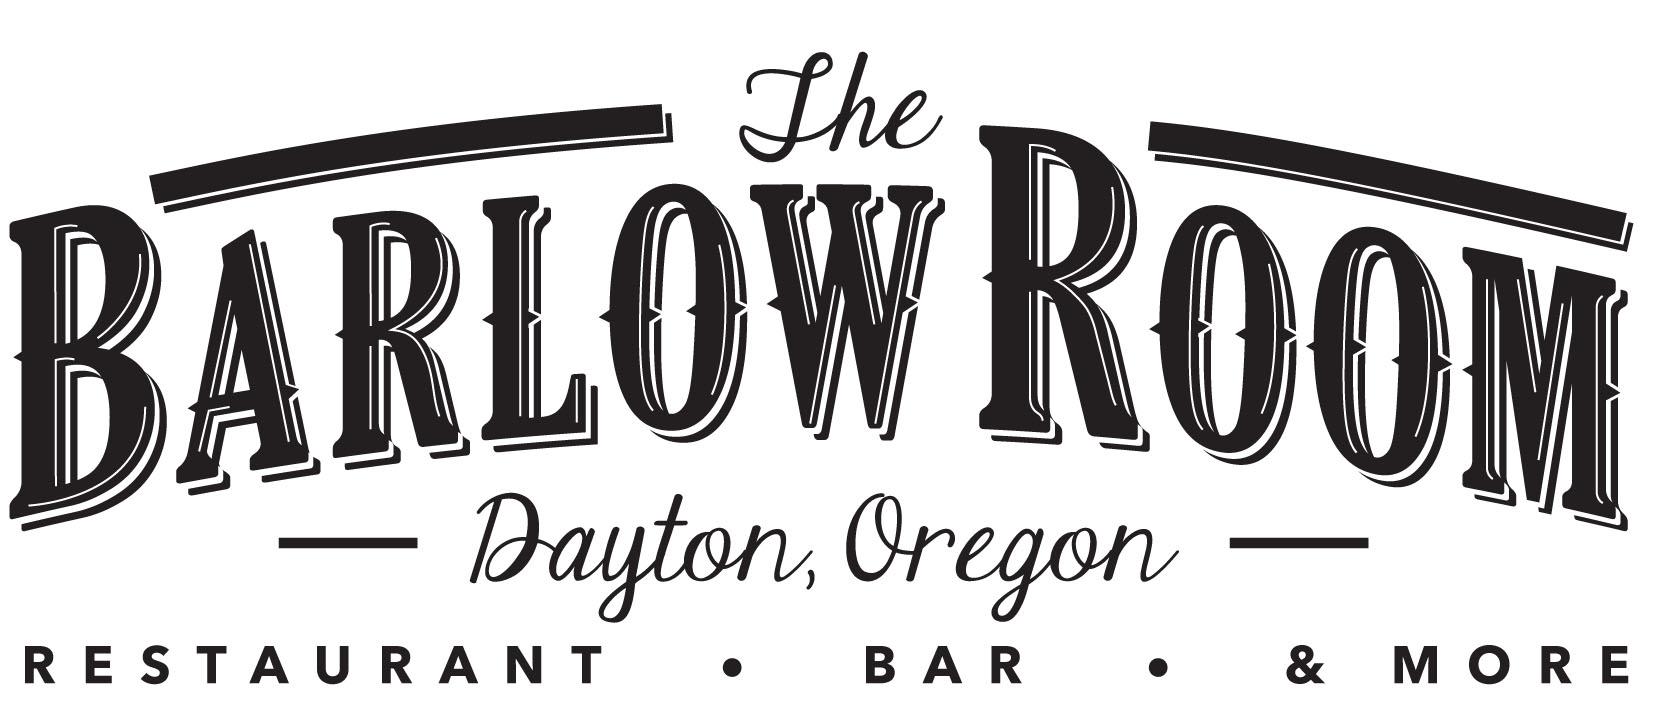 The Barlow Room(comma).jpg